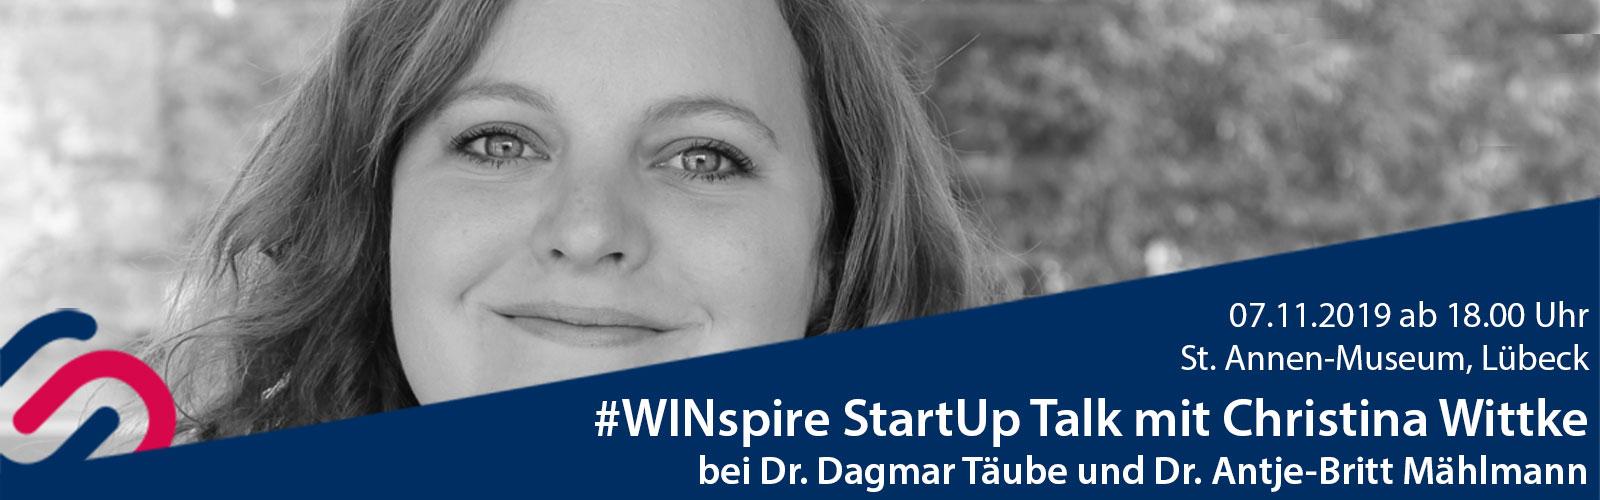 #WINspire StartUp Talk mit Christina Wittke